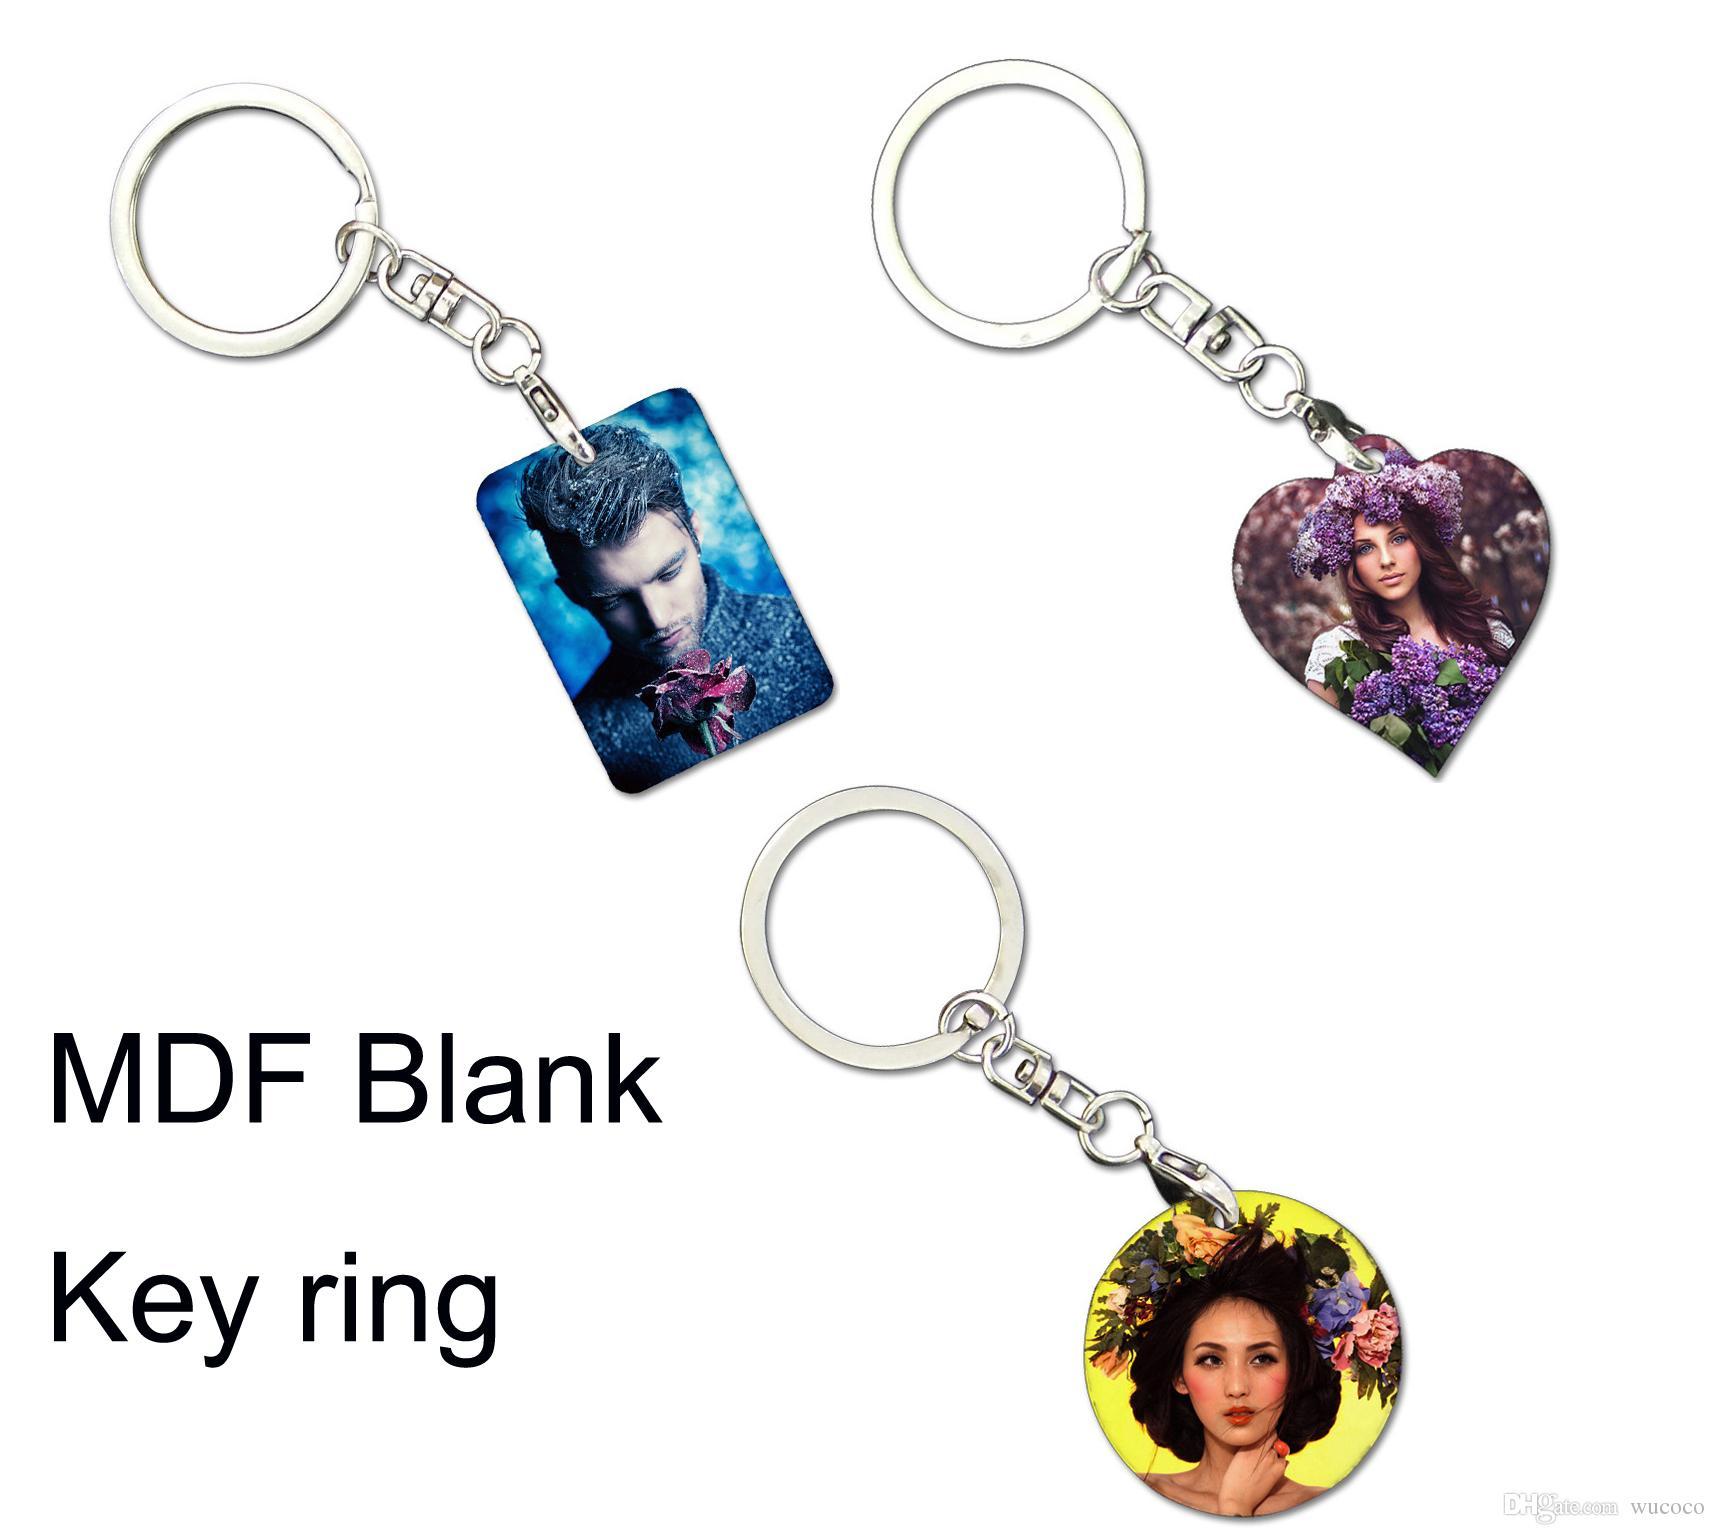 Blank Round / Square / Heart Shape MDF Sublimation Key Ring 10 stycken / Lot